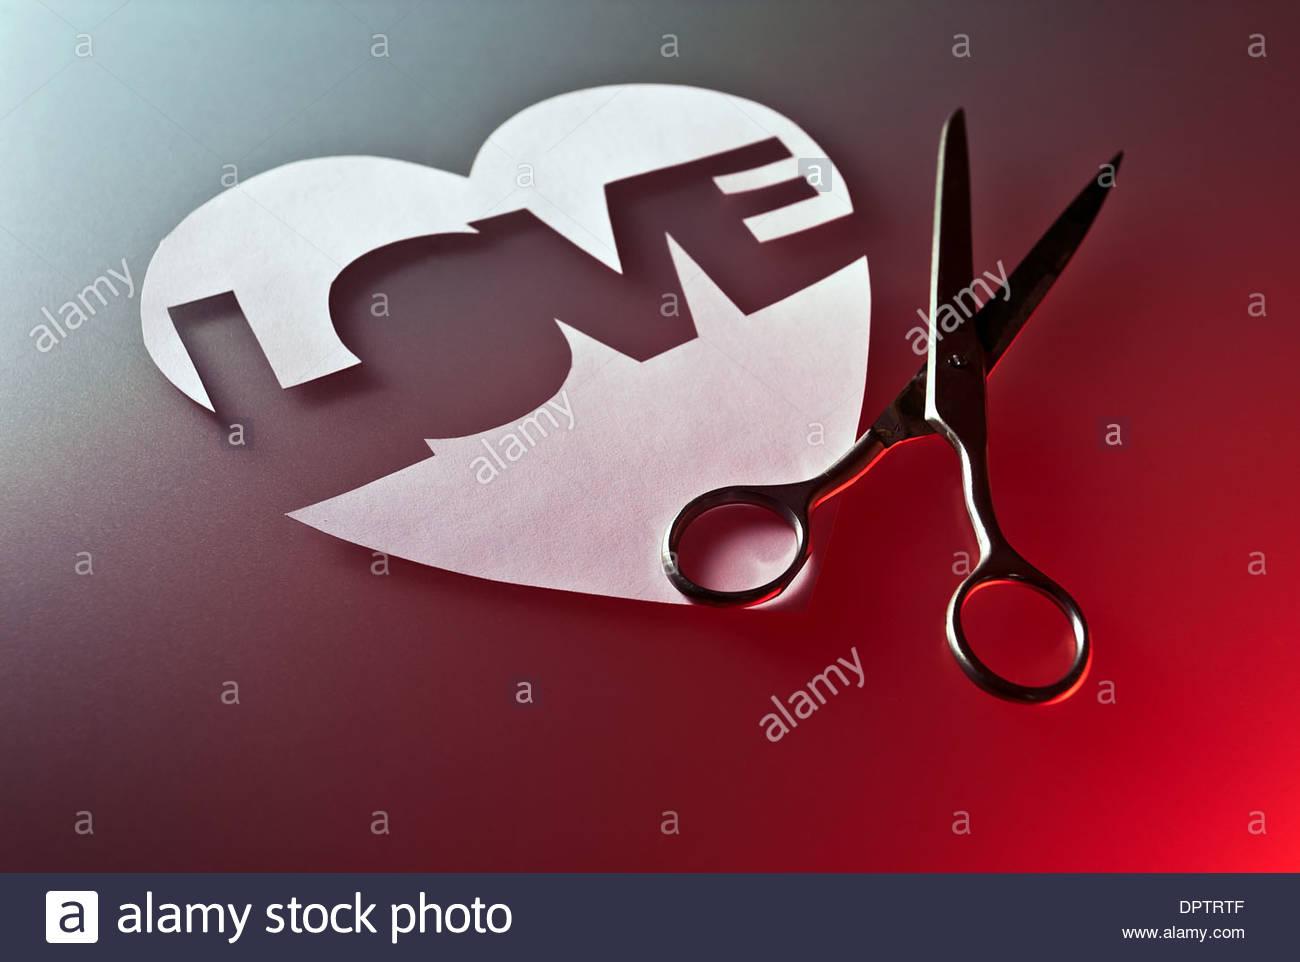 The broken heart a symbol of unfortunate love stock photo the broken heart a symbol of unfortunate love buycottarizona